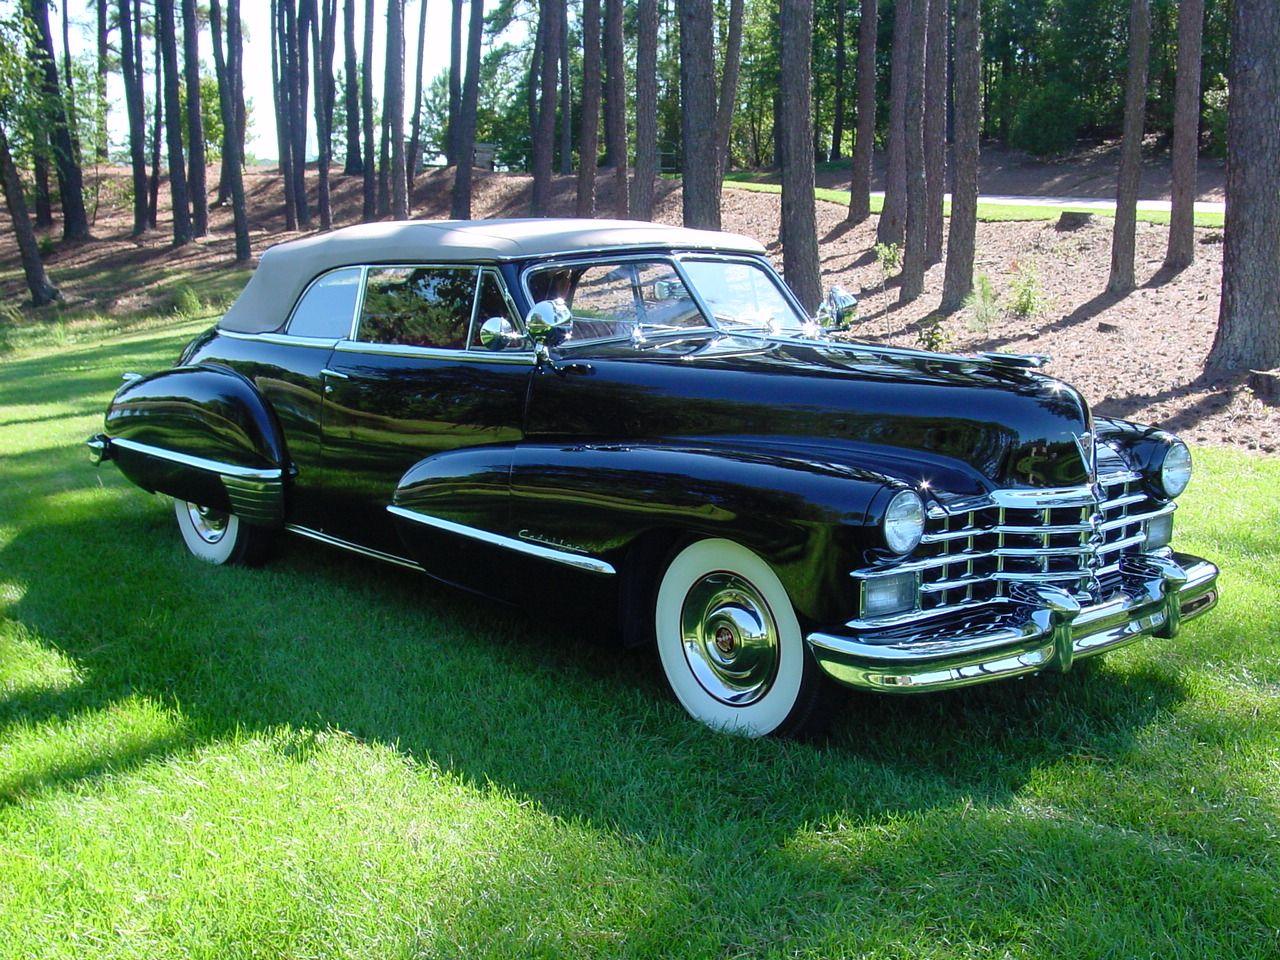 1947 Cadillac Series 62 Convertible Maintenance/restoration of old ...